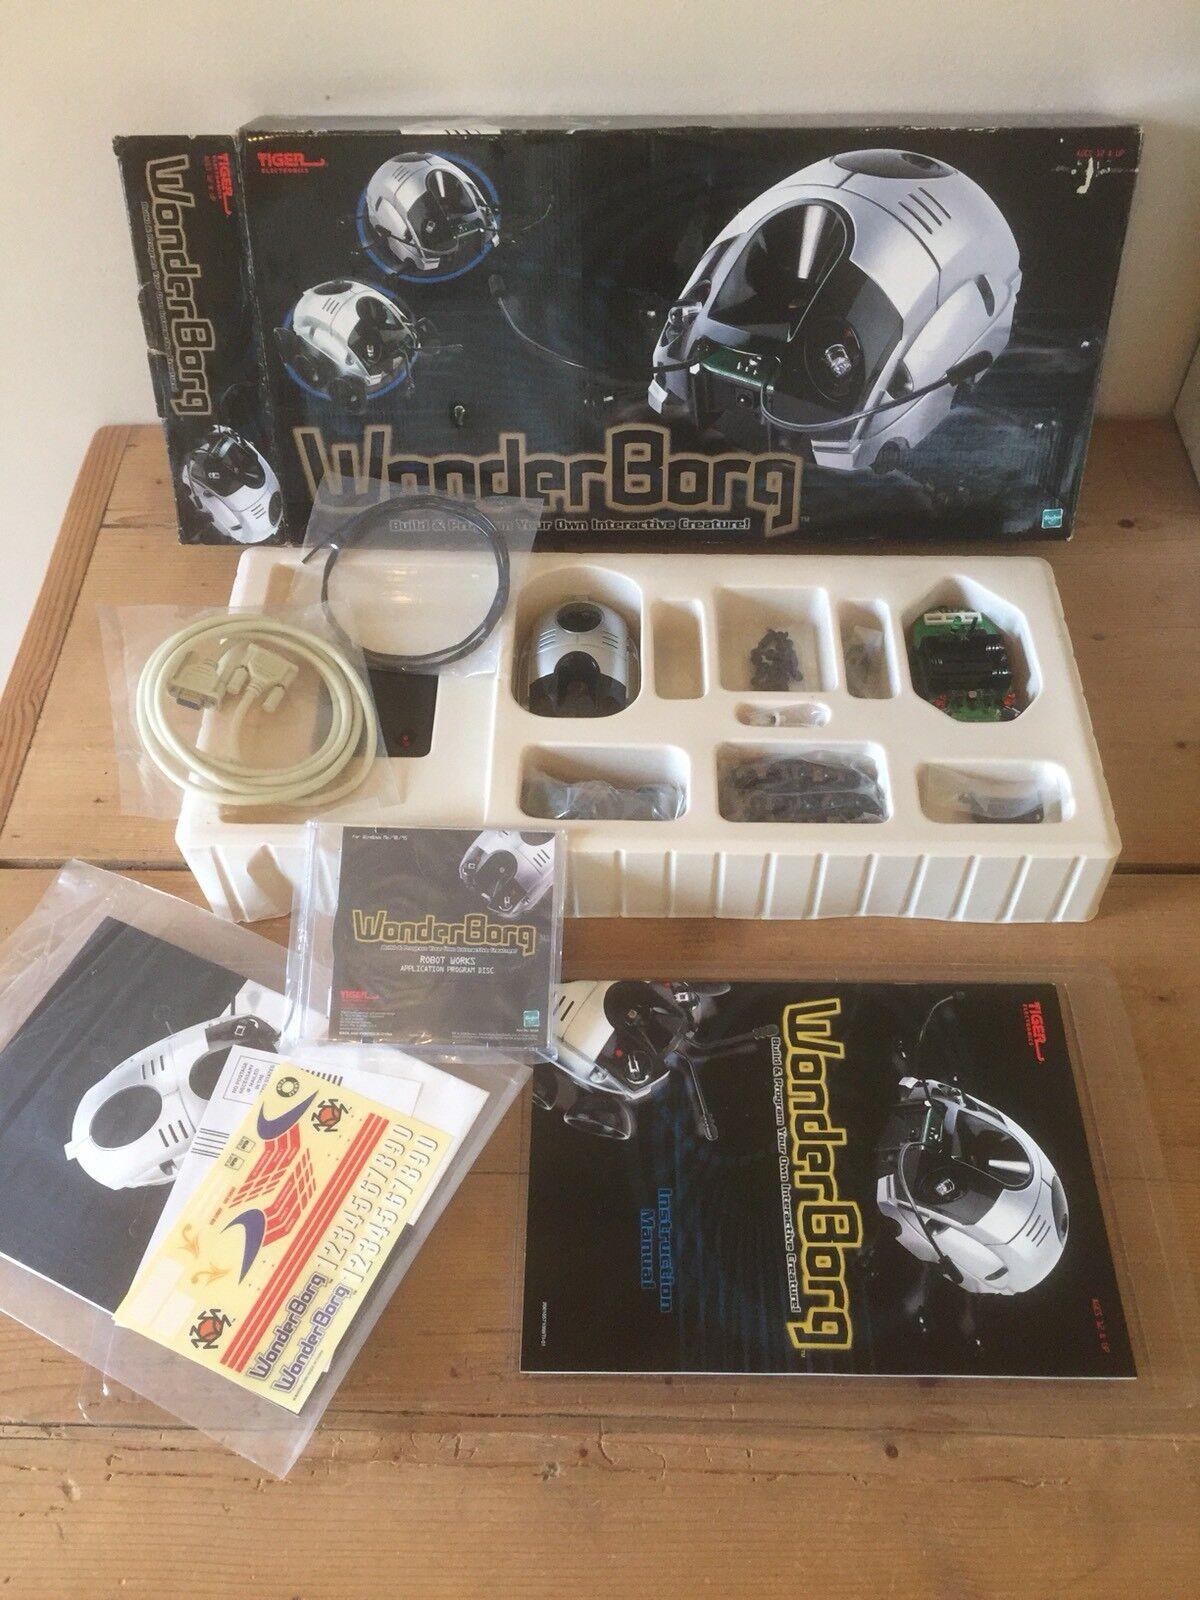 BNIB WONDERBORG Tiger Electronics Build Your Own Robot Bug Set Kit Vintage Retro